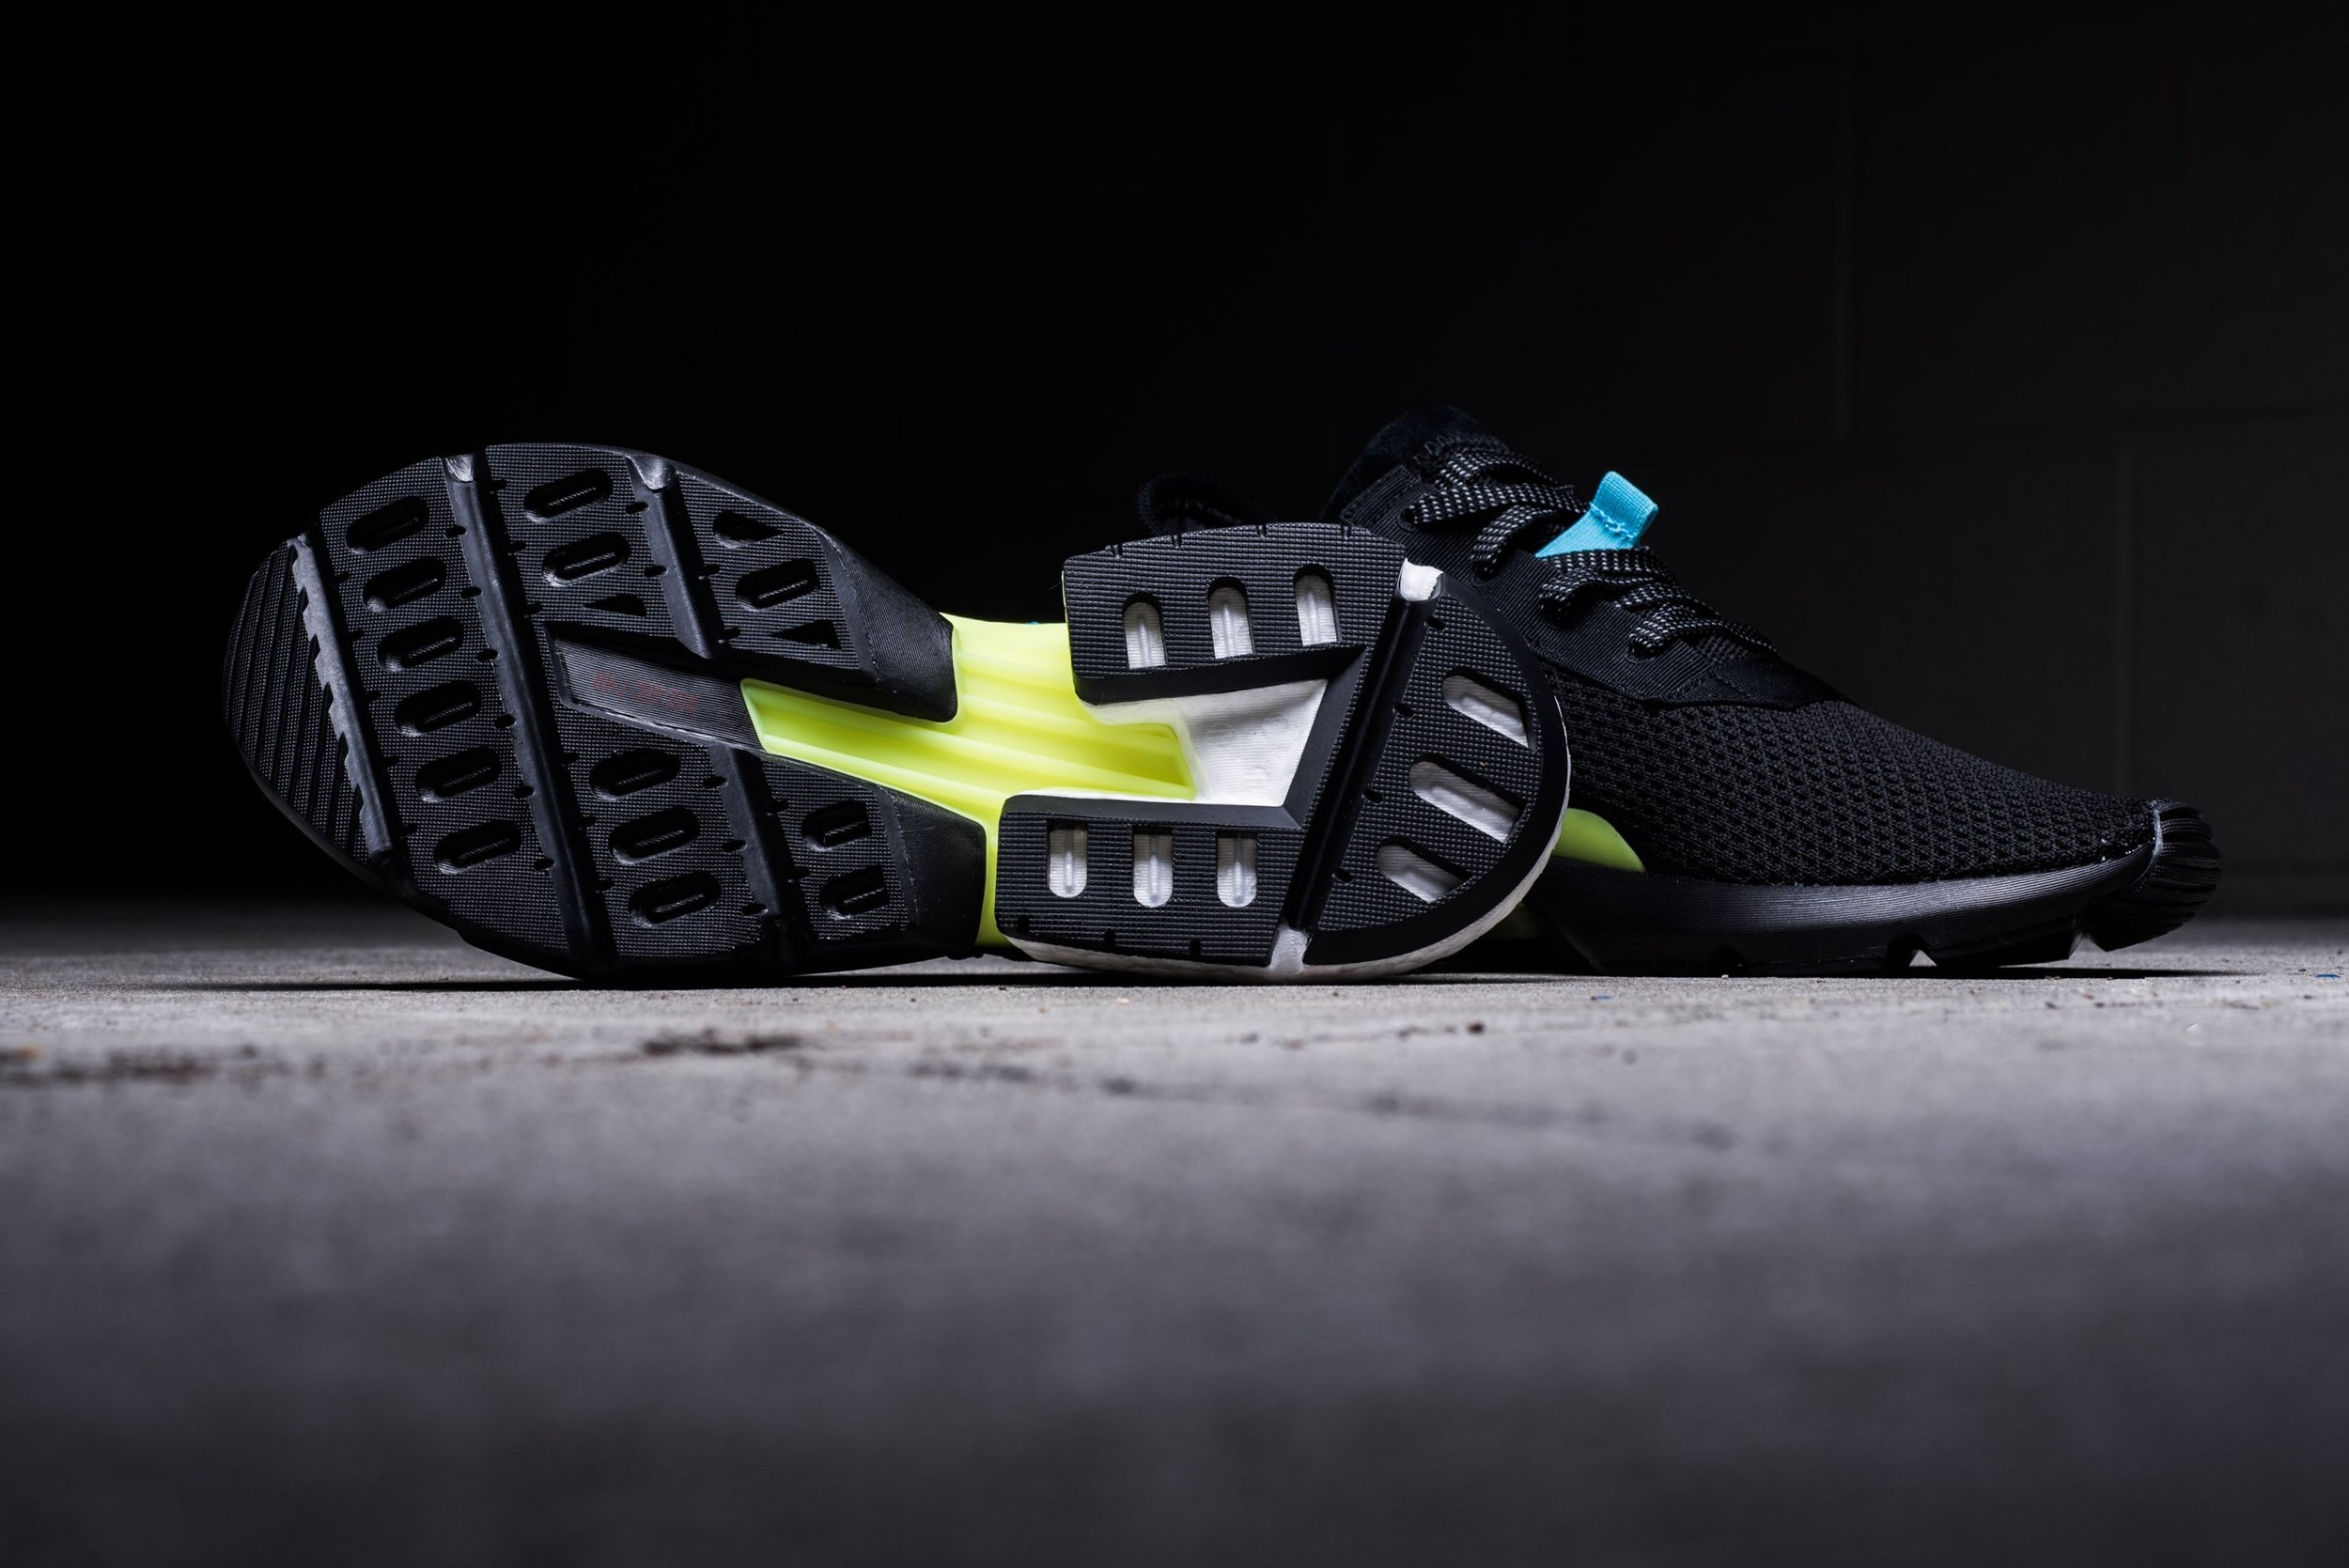 Adidas_POD-S3.1_aq1059_black_white_sneaker_politics_10.jpg